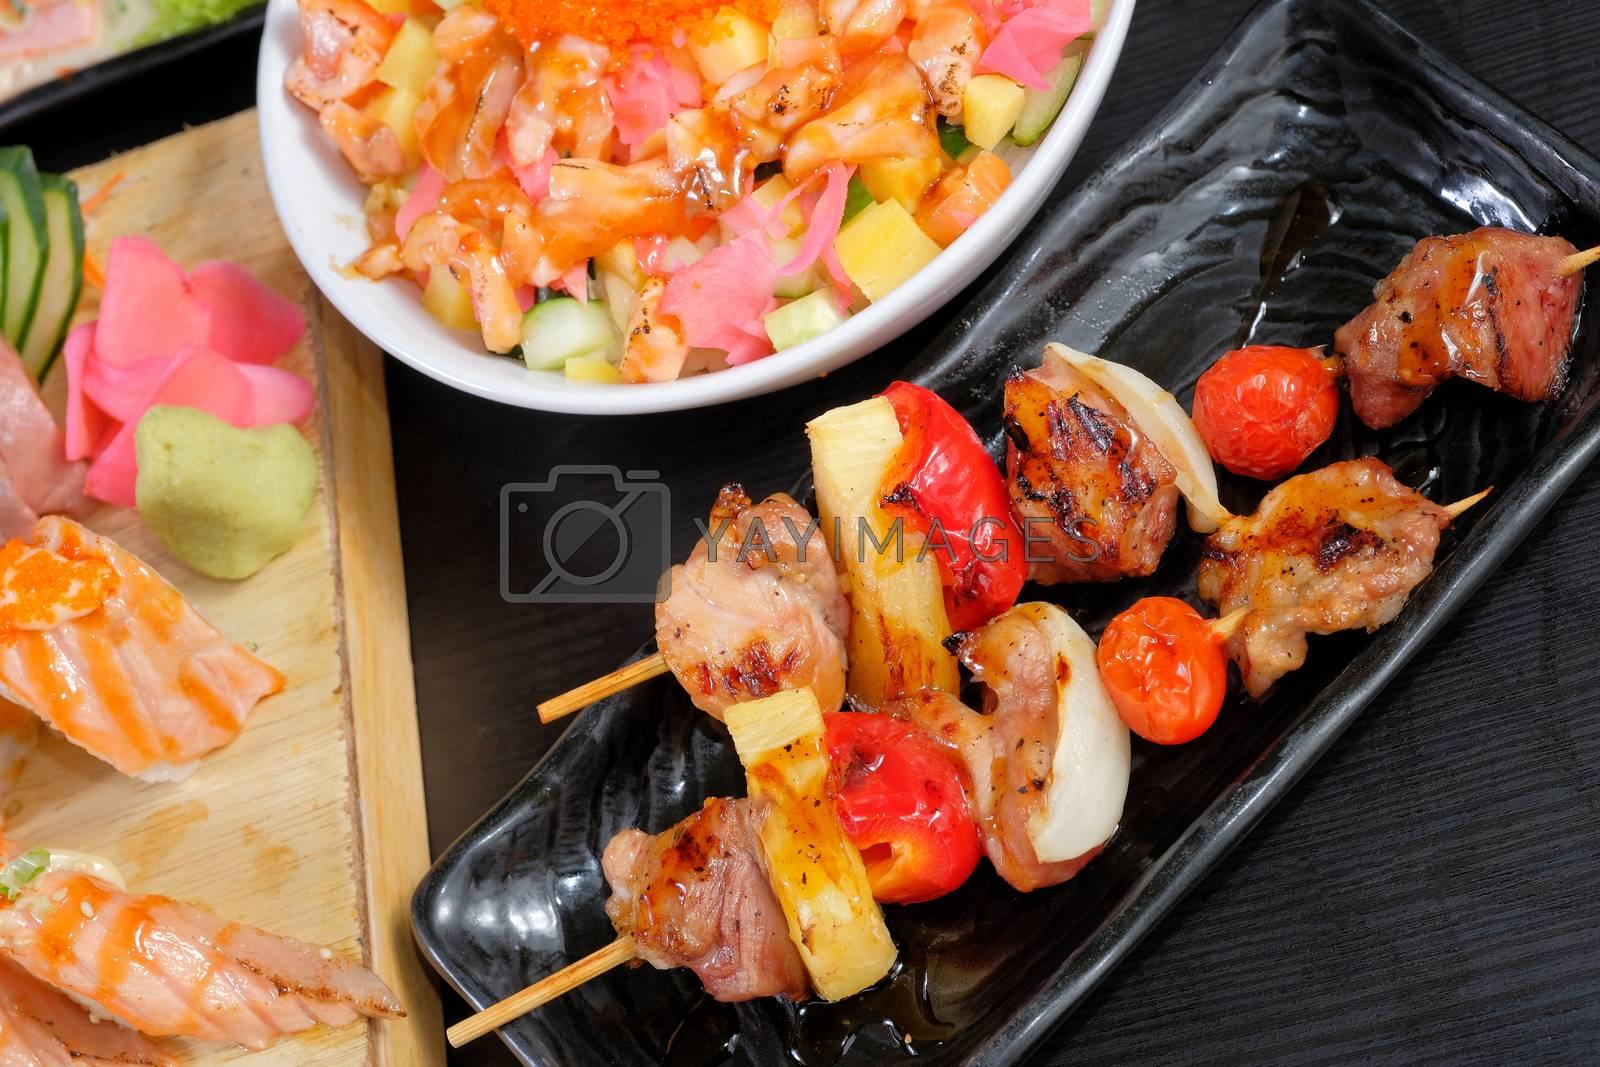 Japanese BBq pork grill